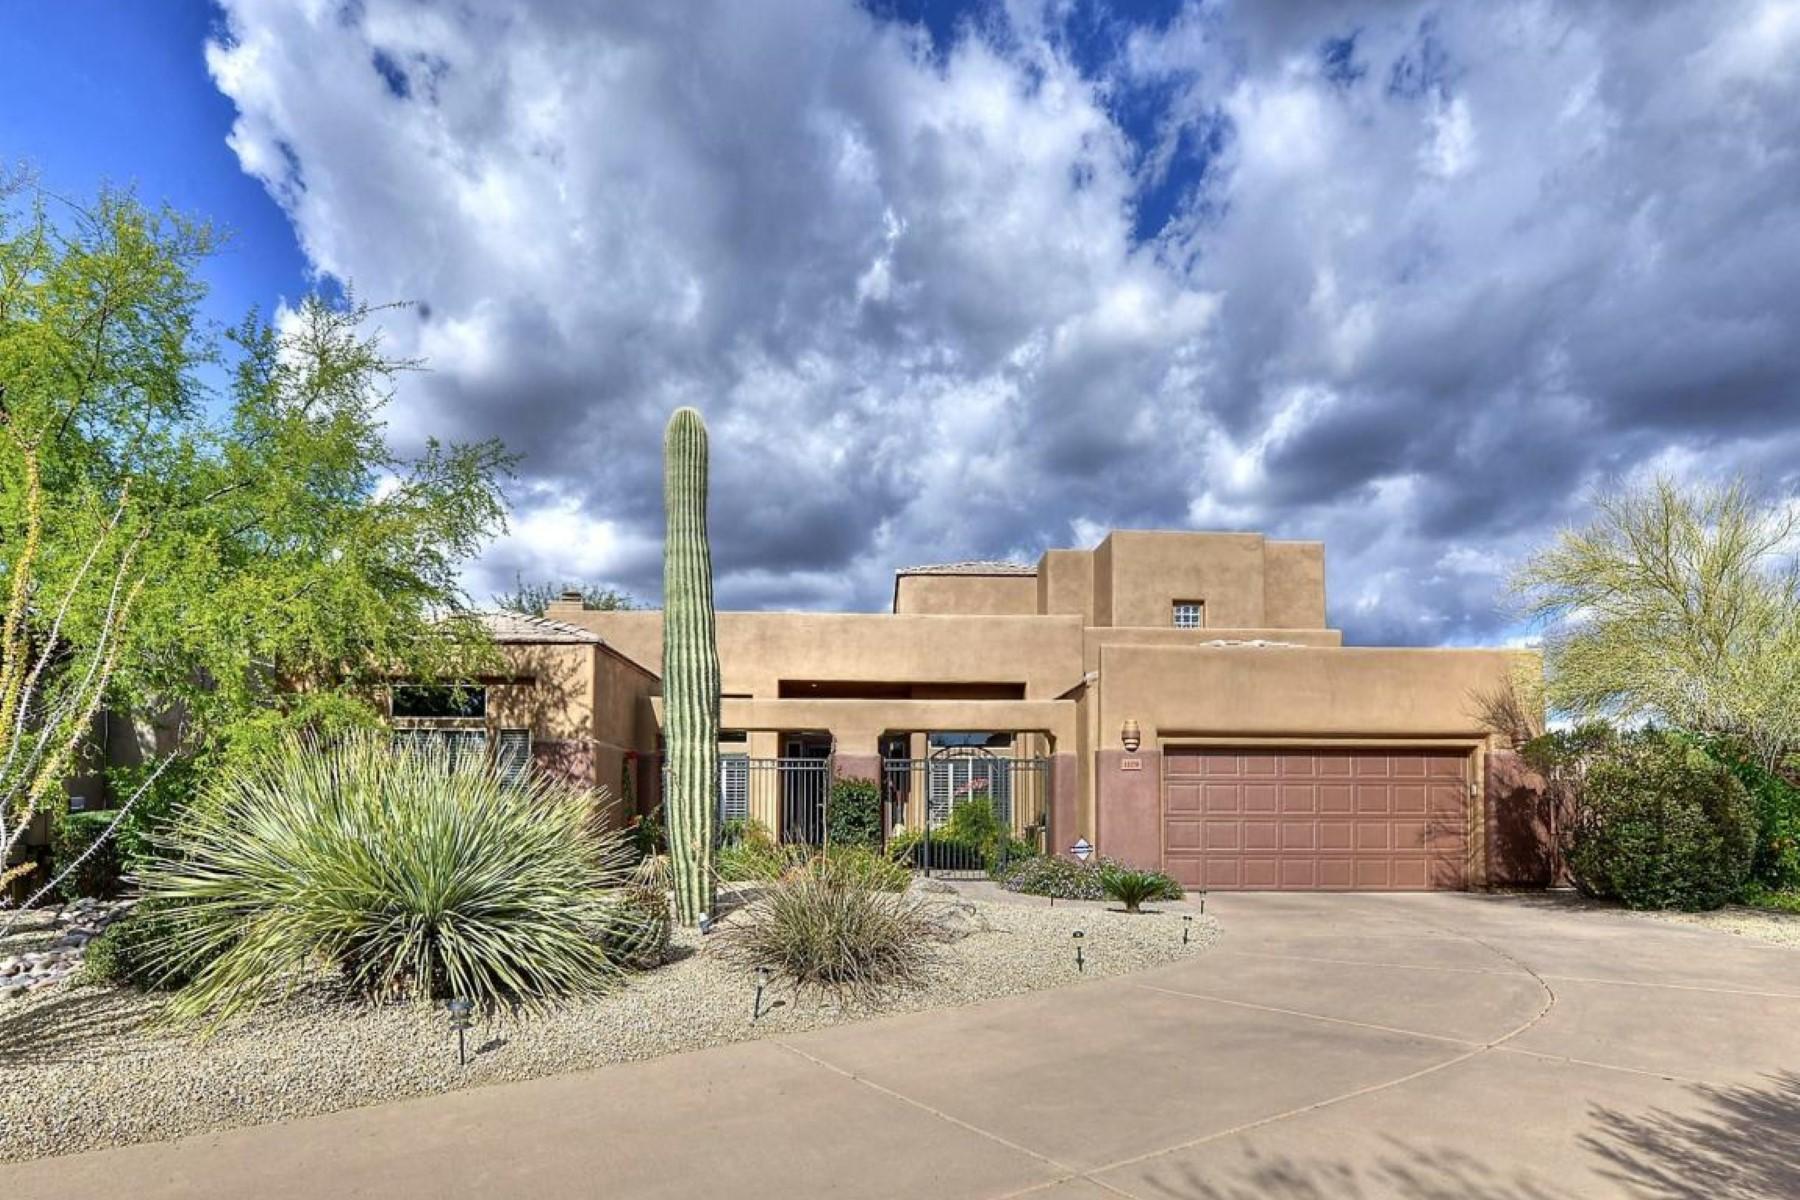 独户住宅 为 销售 在 Stunning move in ready home in Troon North 11178 E Mark Ln 斯科茨代尔, 亚利桑那州, 85262 美国